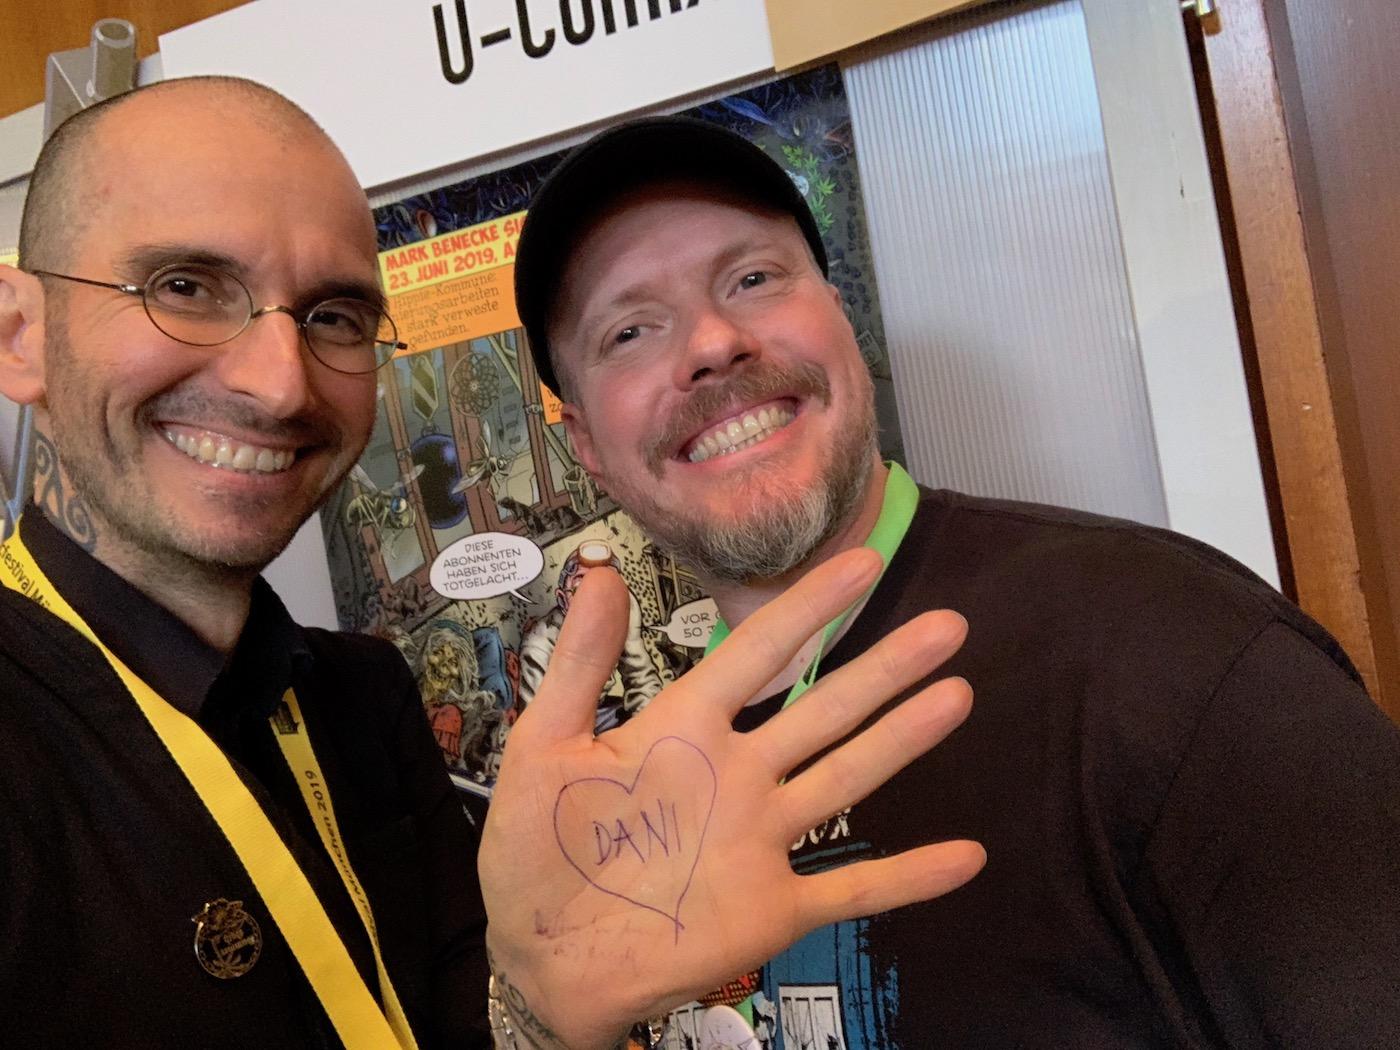 mark_benecke_comic_festival_muenchen_munich_comic_con_2019 - 83.jpg